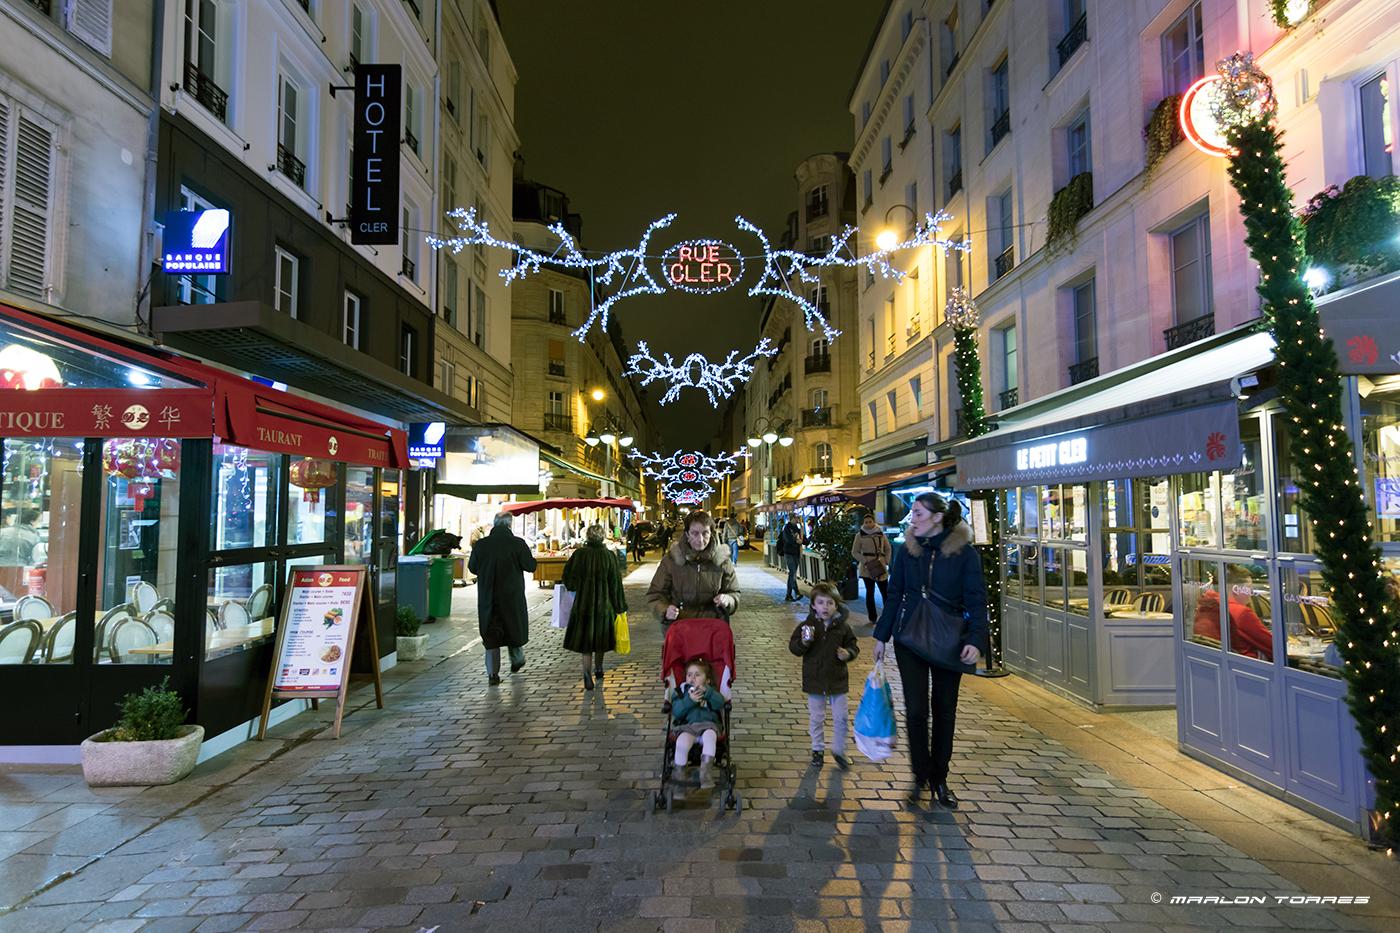 Rue Cler, Paris, France. Photo: Marlon I. Torres